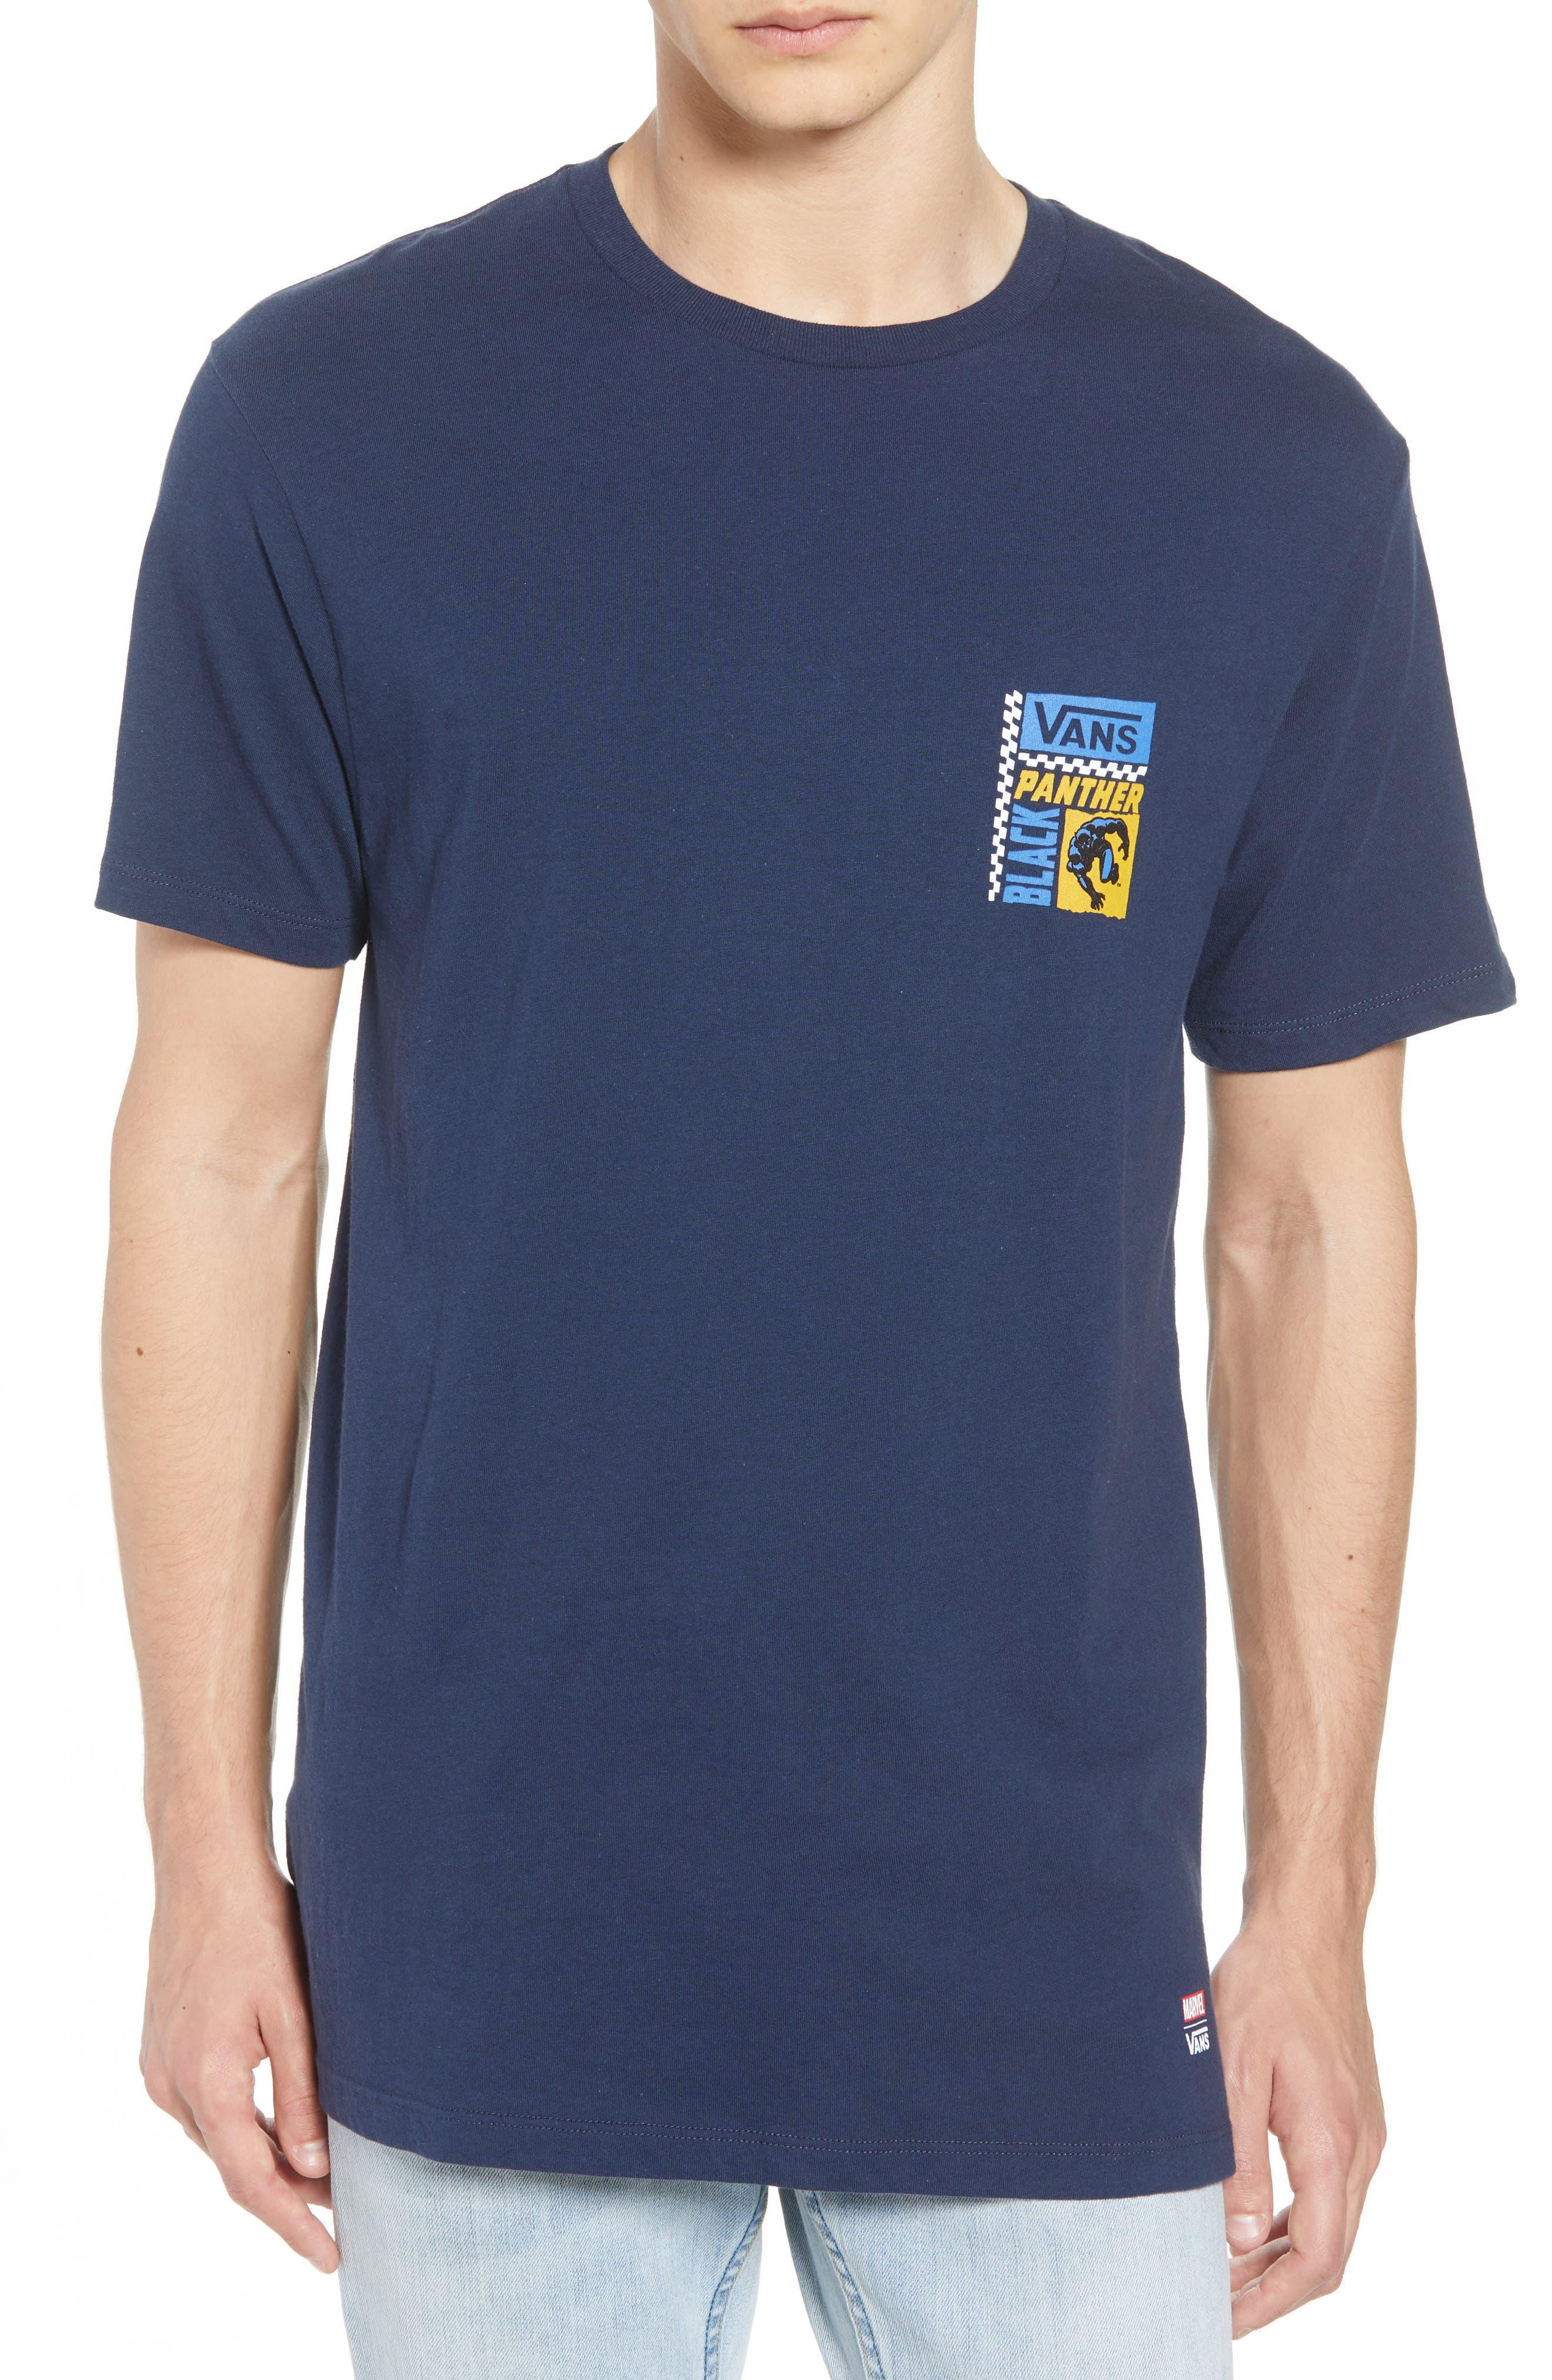 x Marvel<sup>®</sup> Black Panther T-Shirt,                             Main thumbnail 1, color,                             Dress Blues